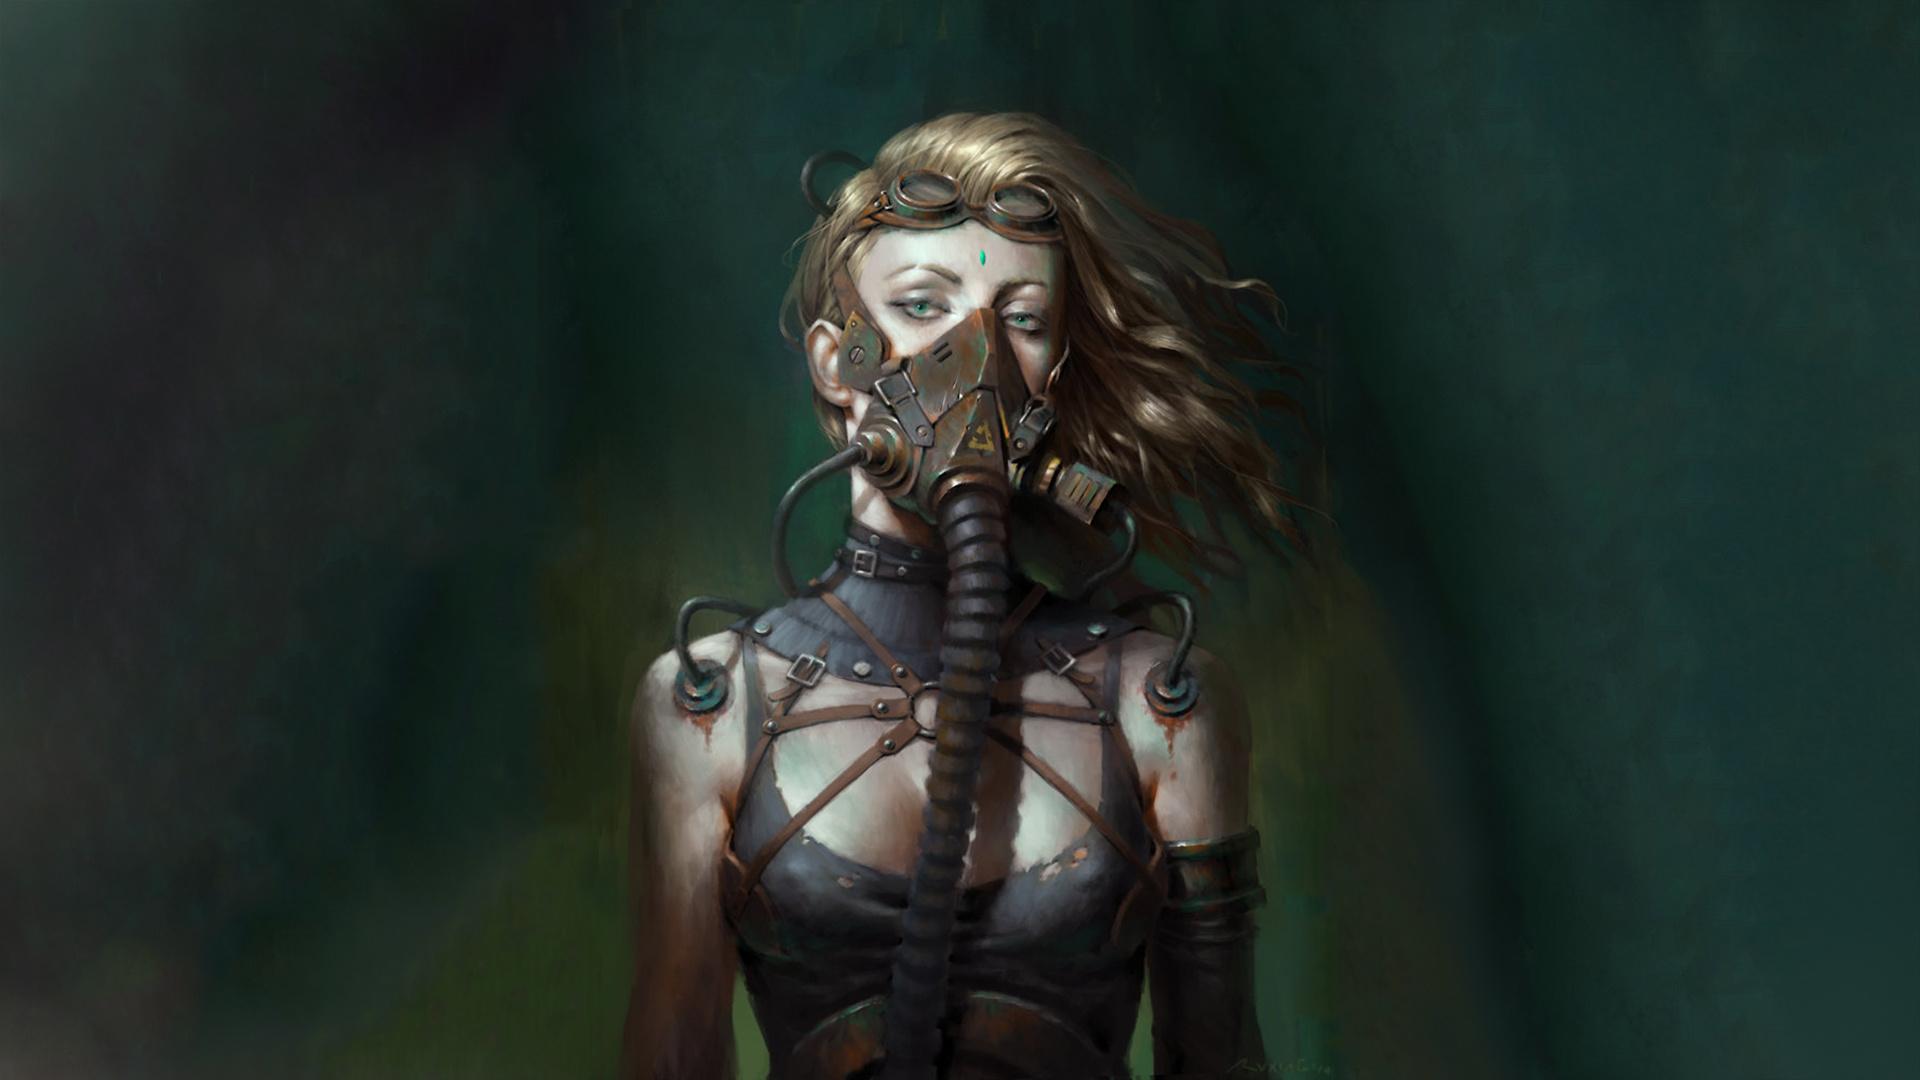 Cyberpunk Mask hd wallpaper download